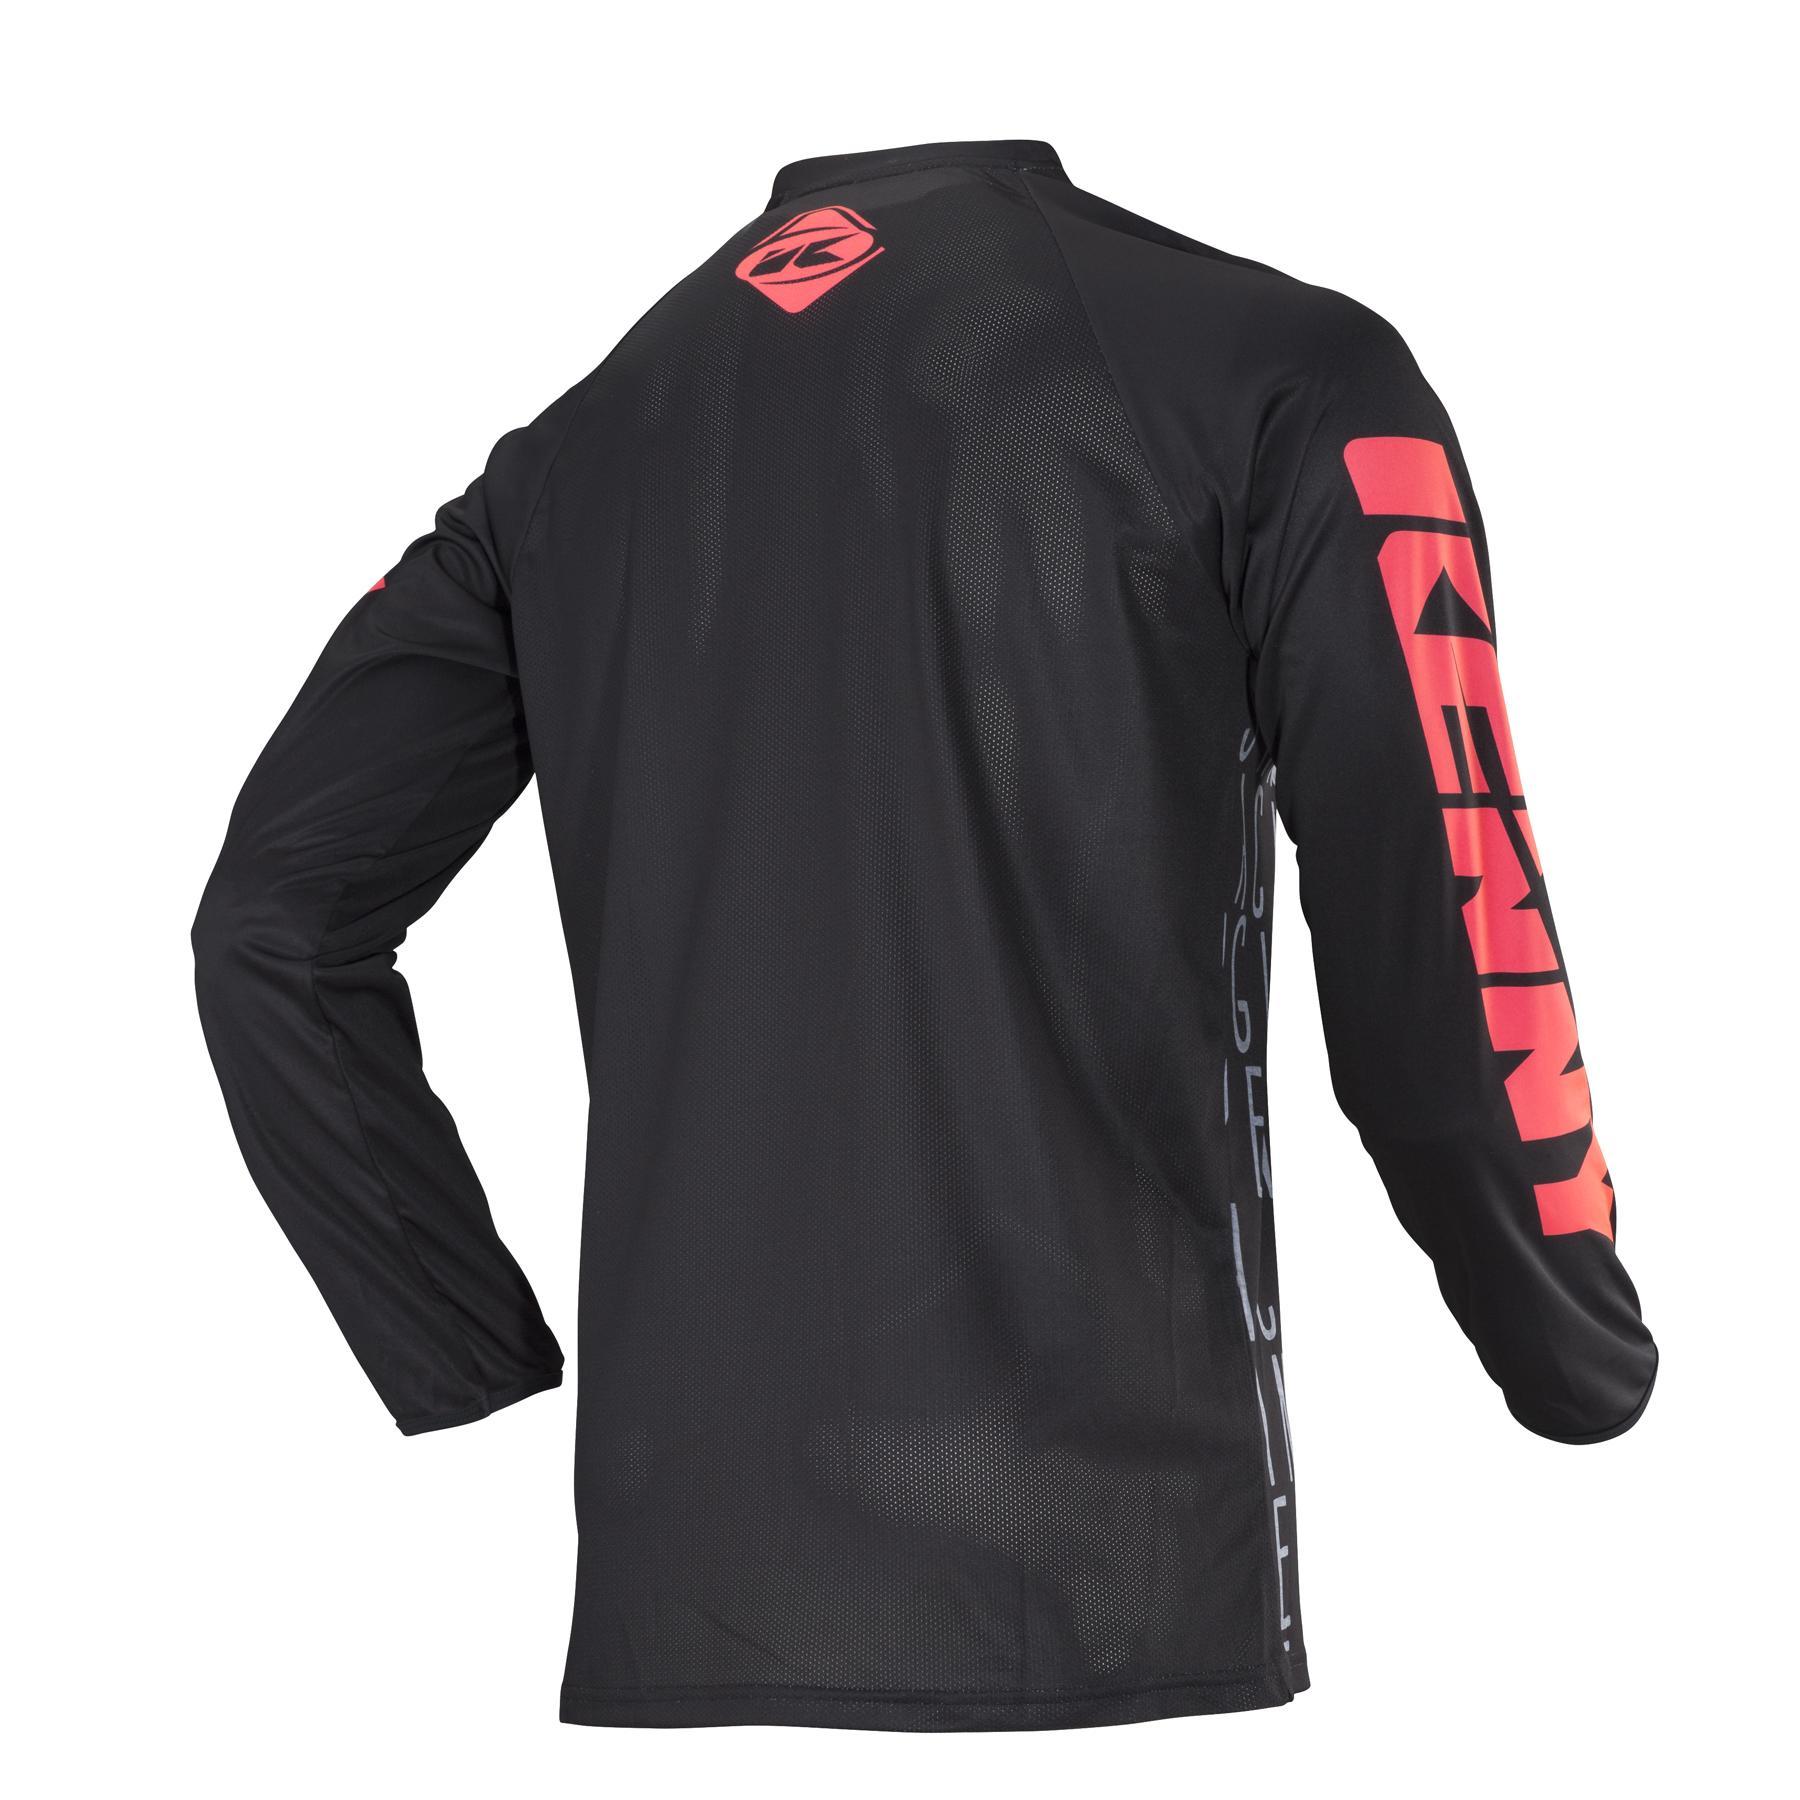 Shirt performance life is racing kenny racing for Custom race shirts no minimum